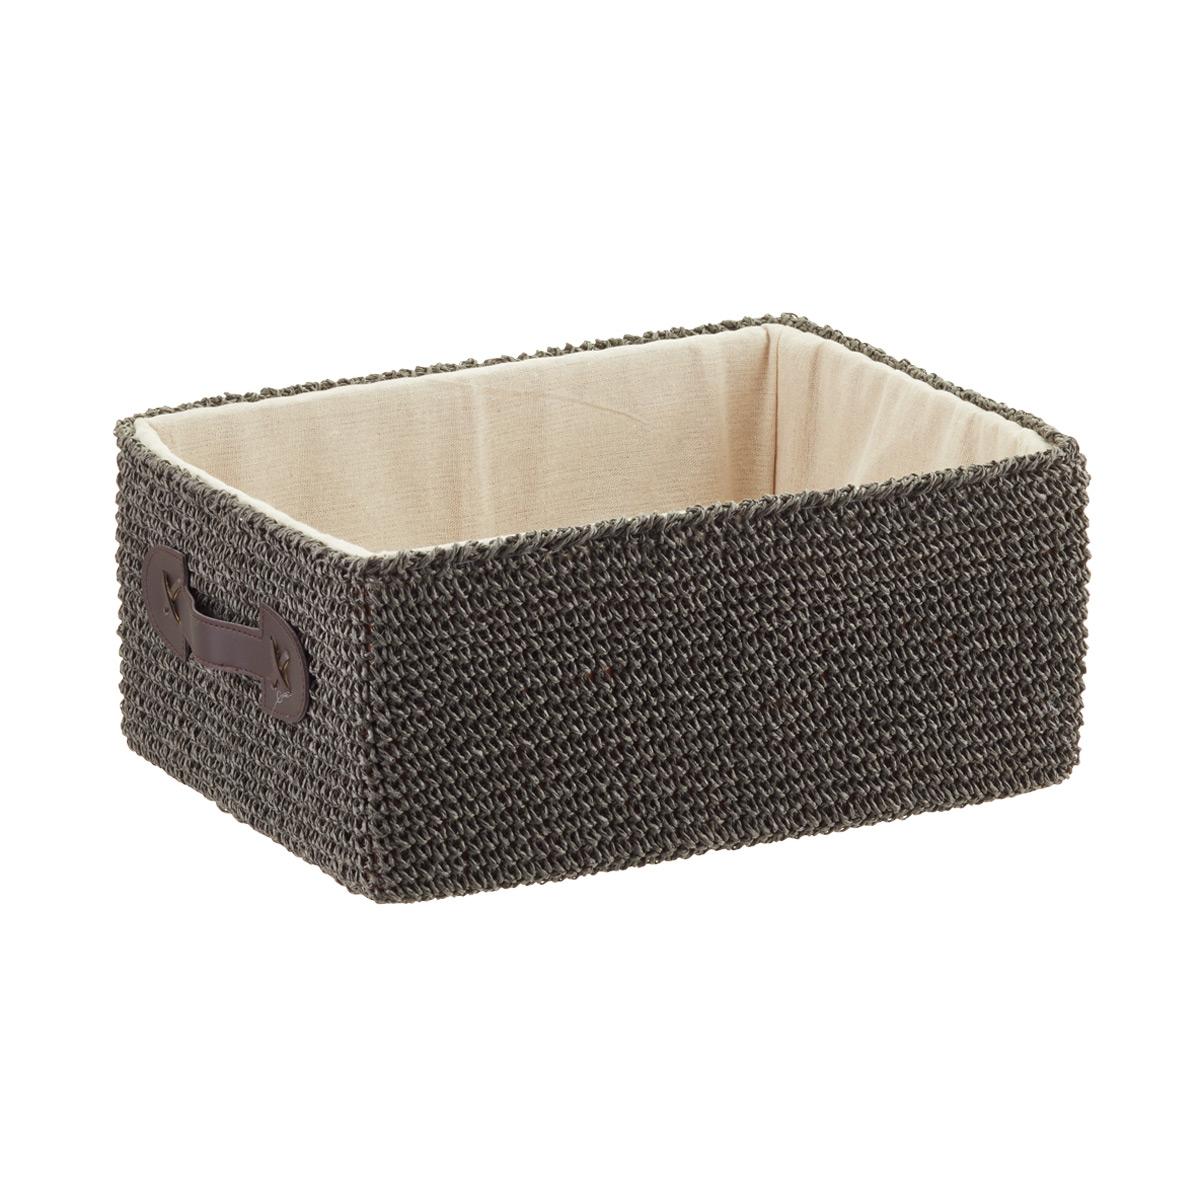 Grey Crochet Rectangular Storage Bins With Handles; U0026; U0026. Roll Over To Zoom